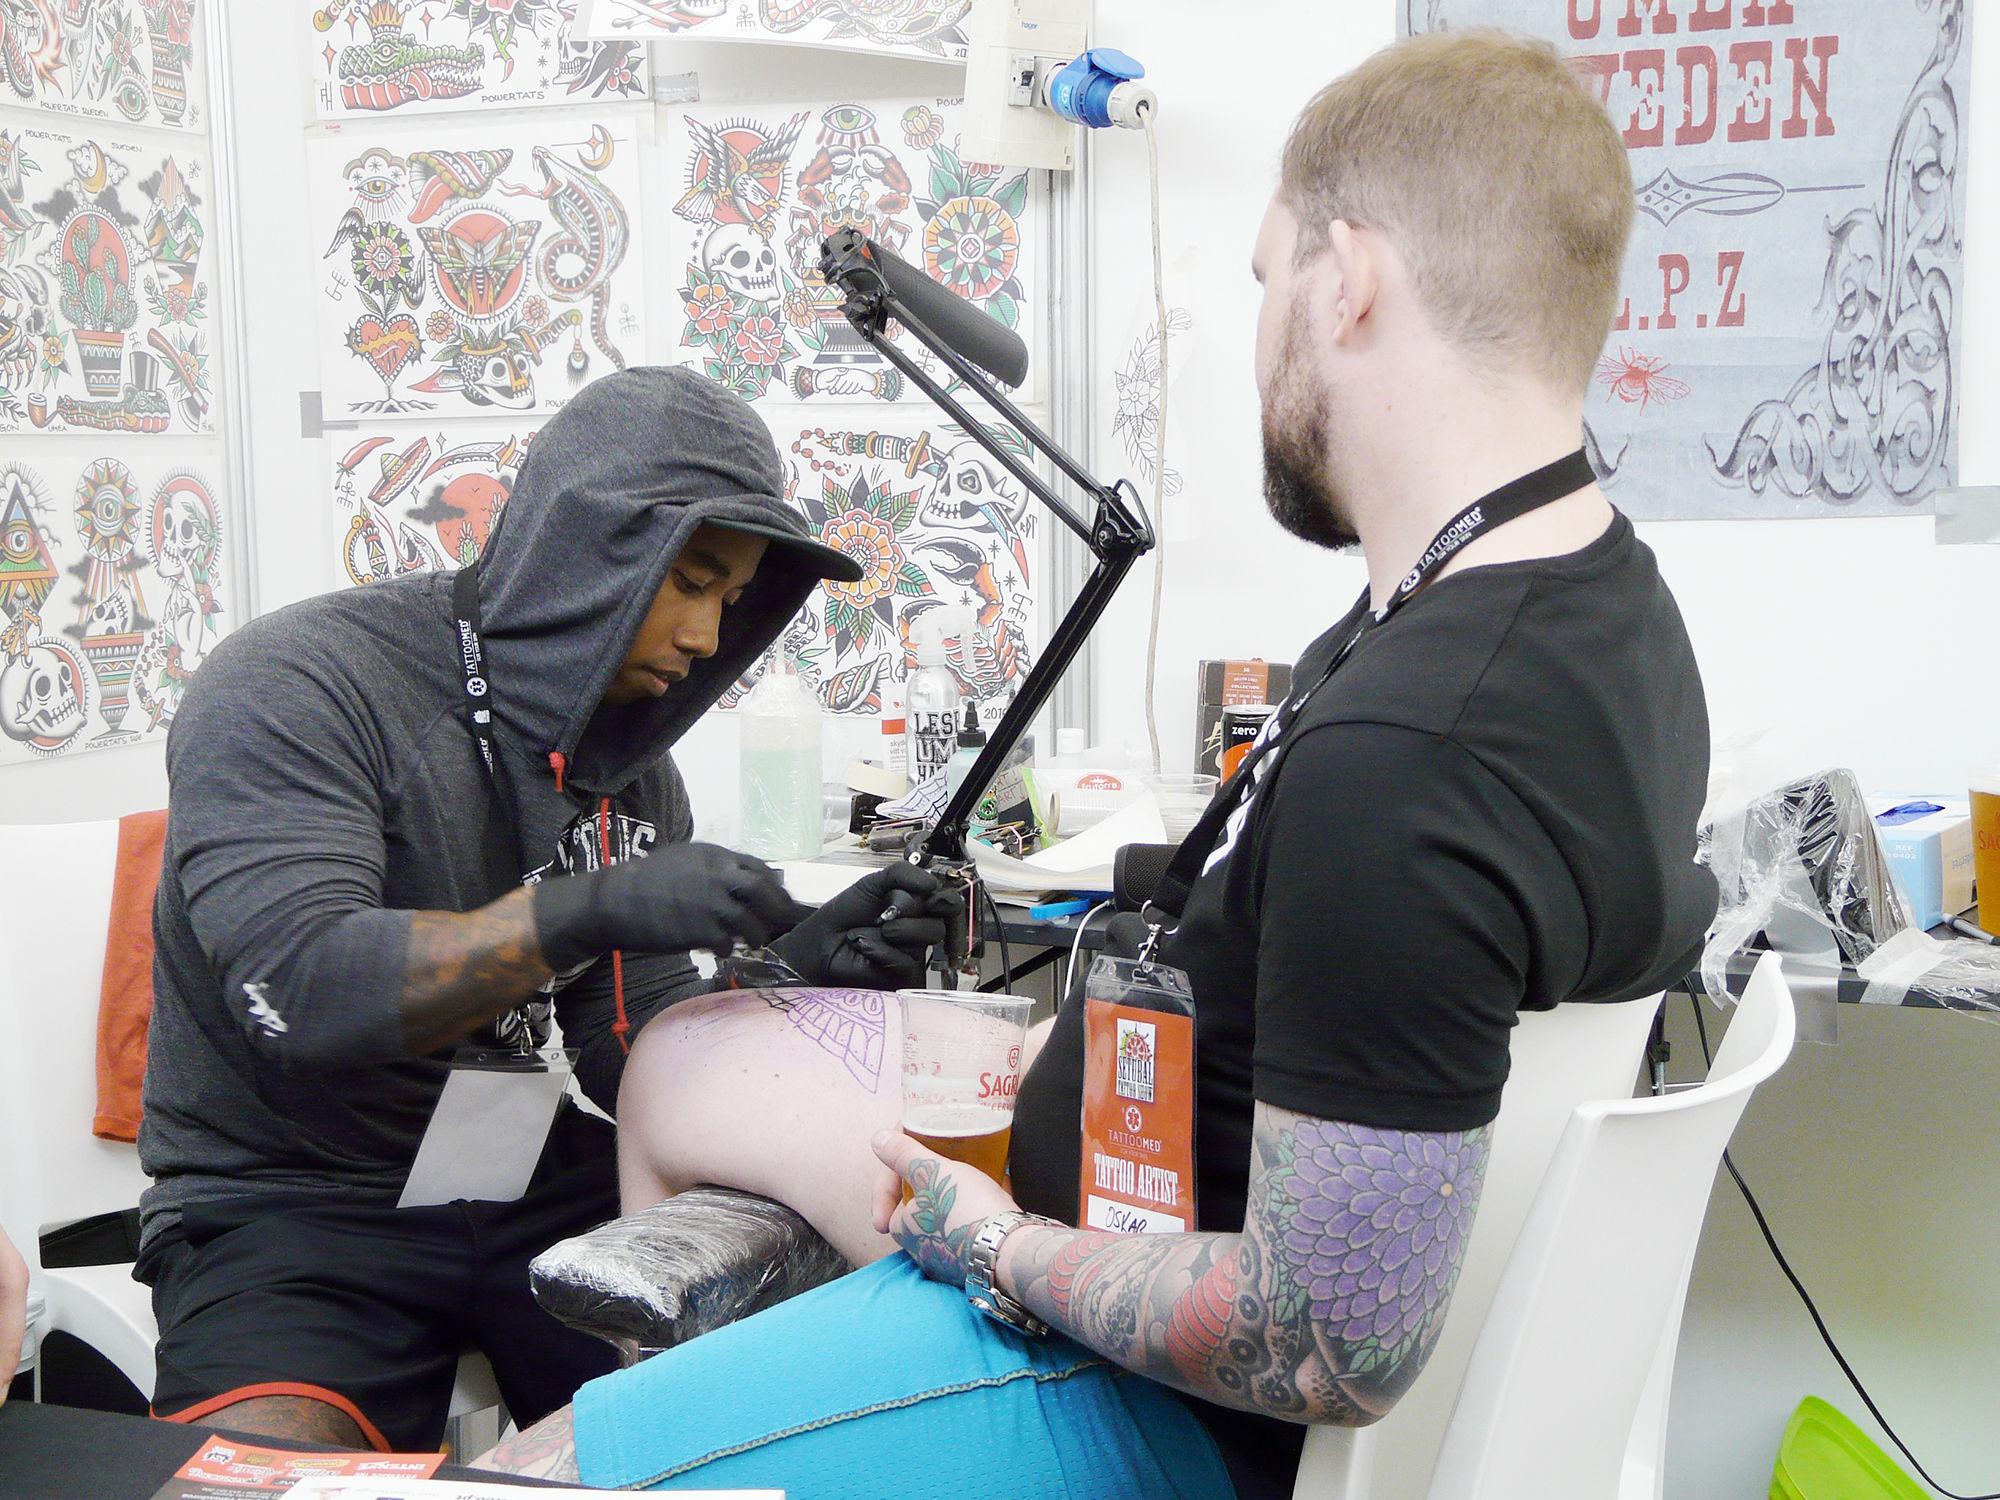 filip henningson tattooing a client's leg